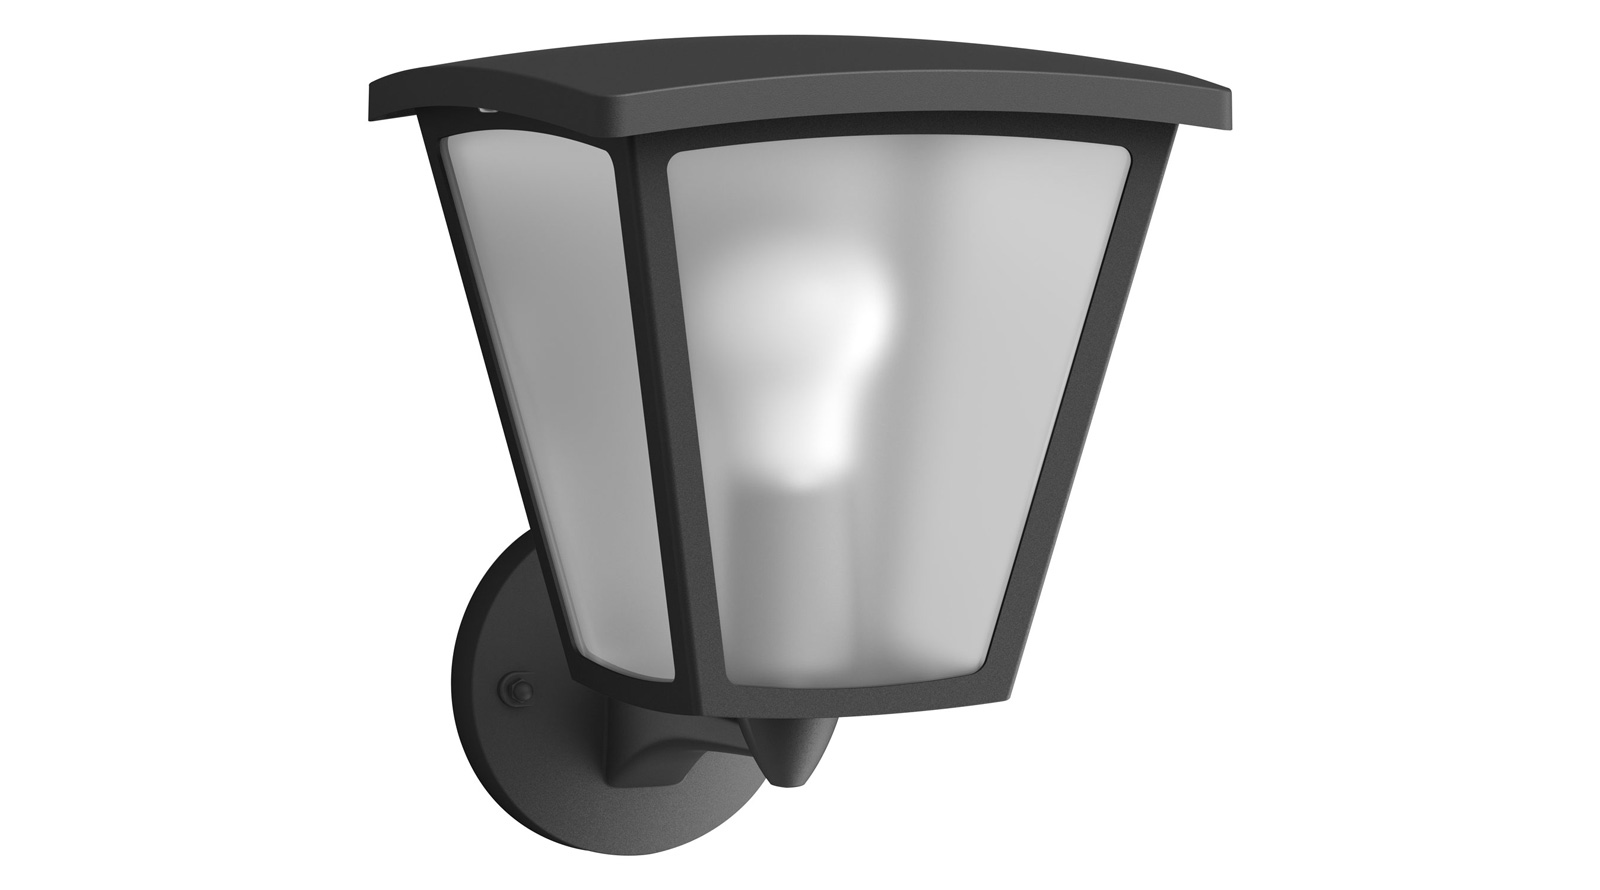 Philips Hue Inara Smart Outdoor Wall Light Homekit News